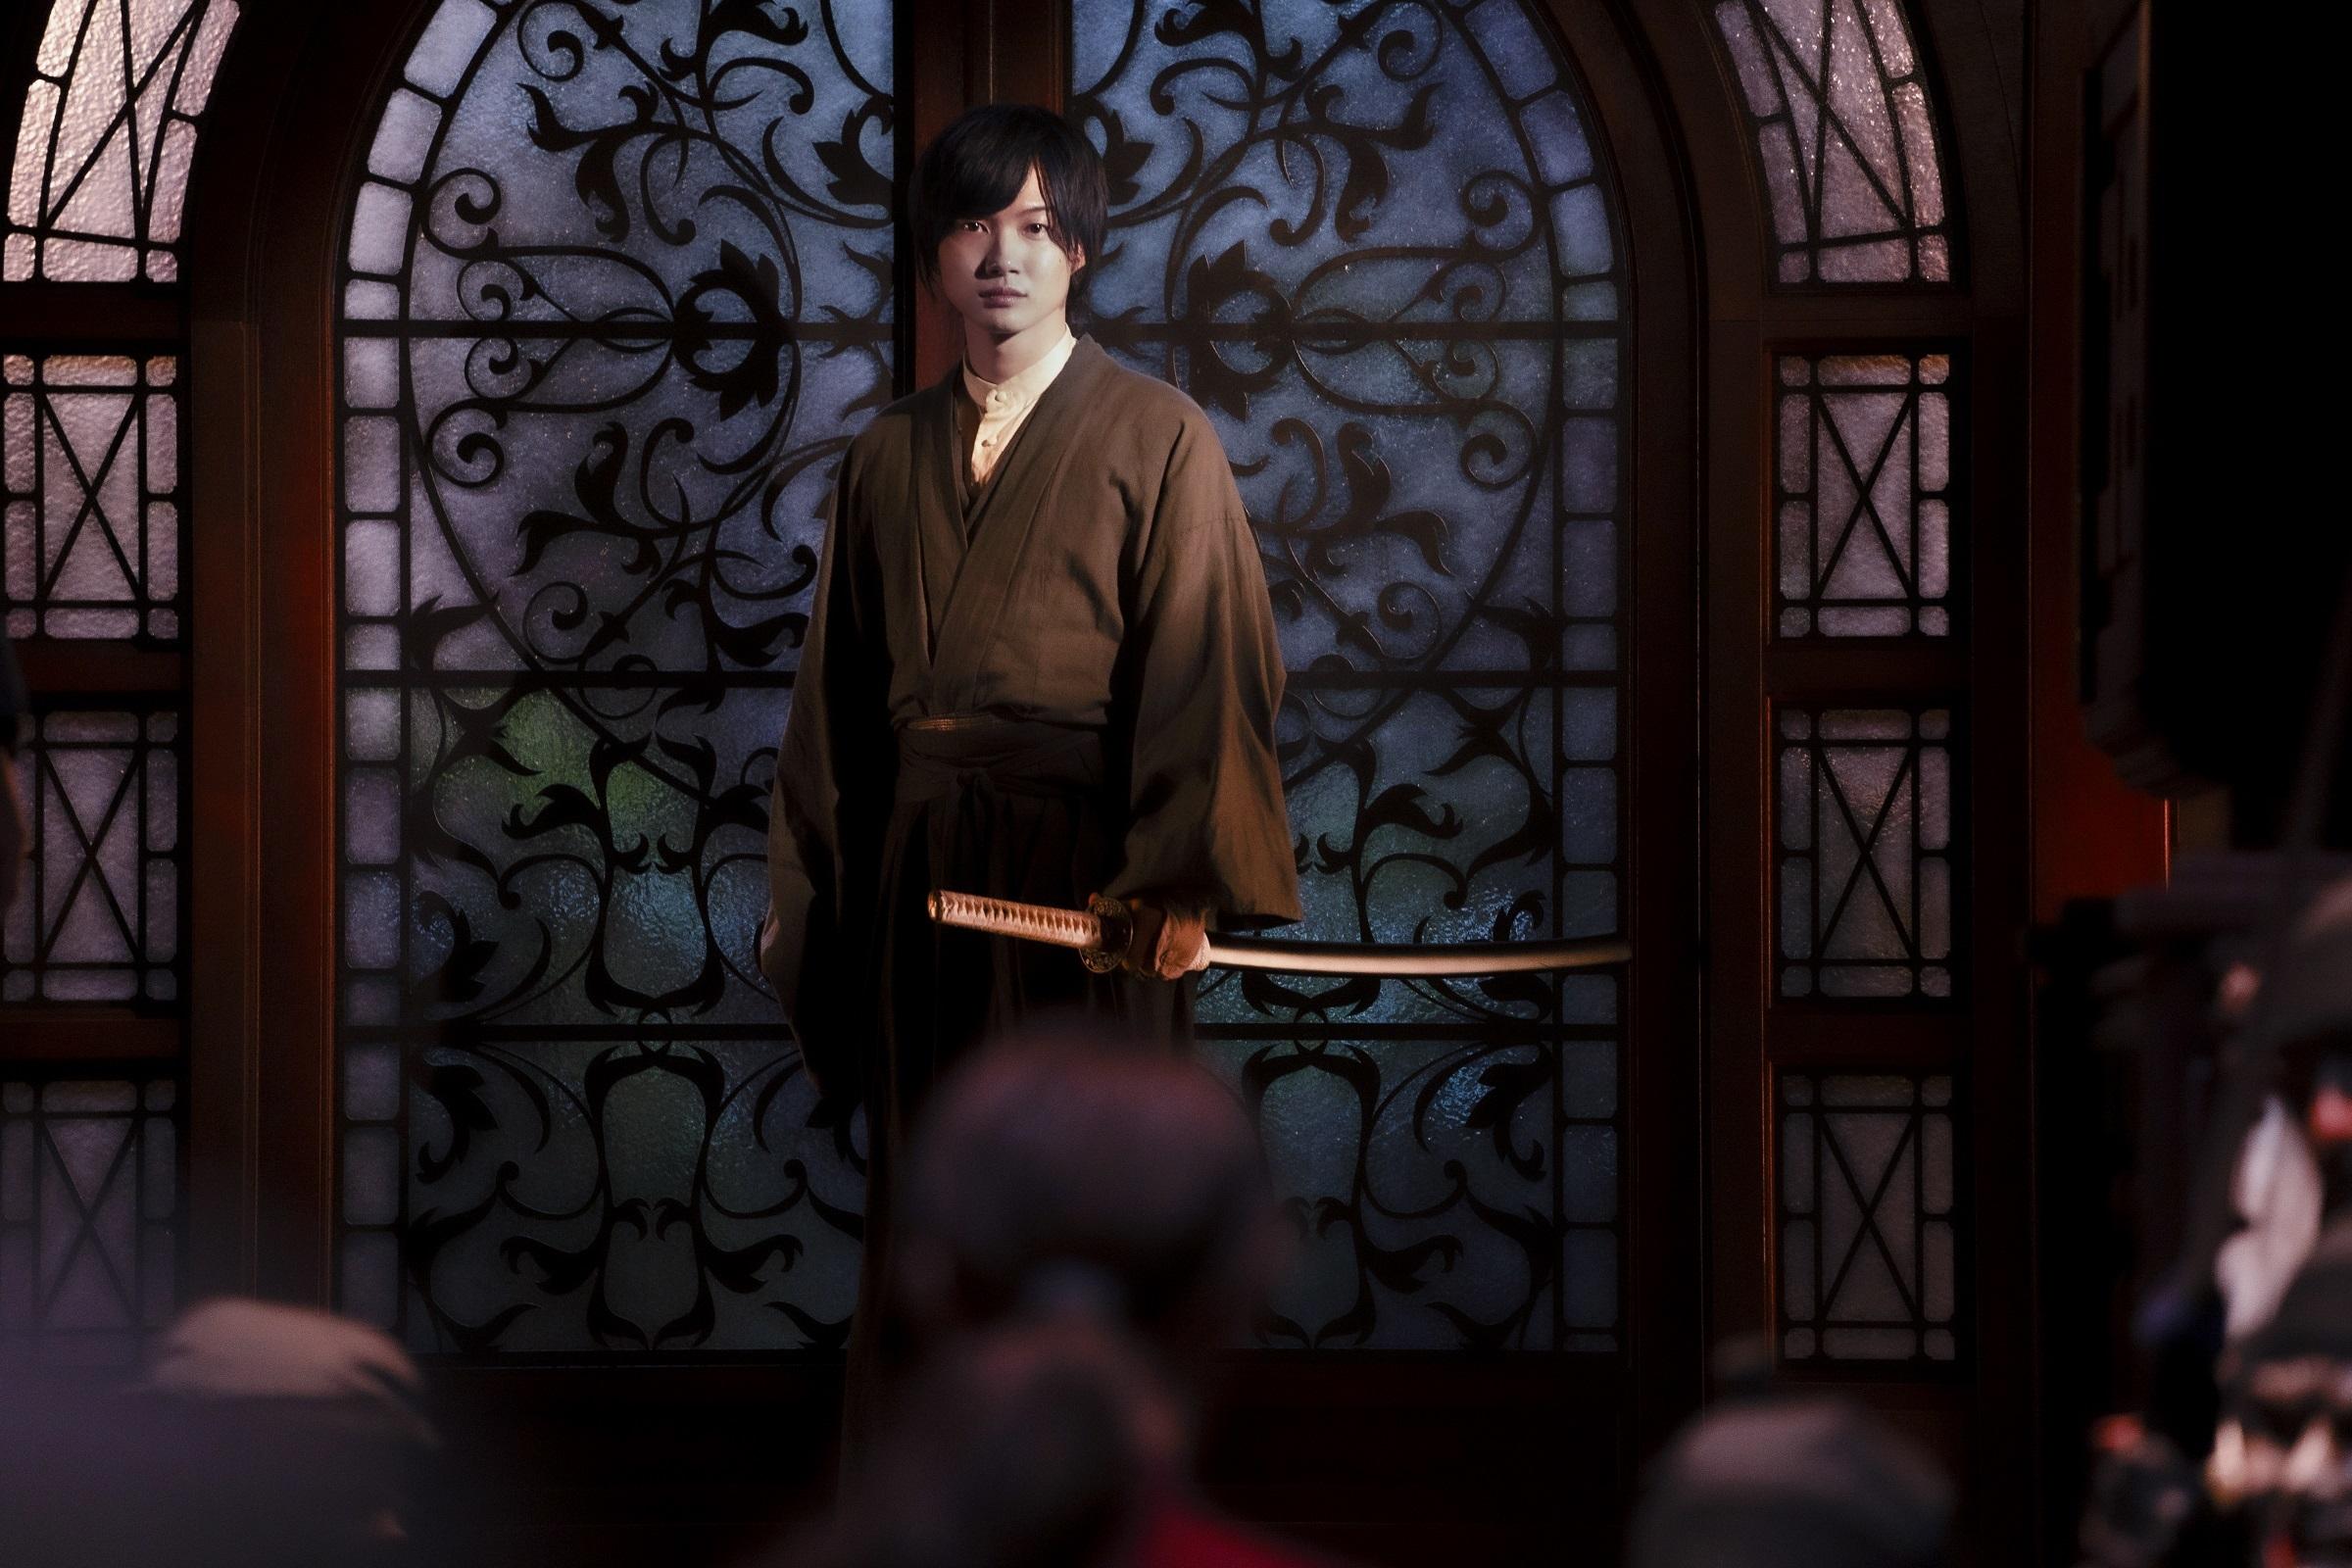 (C)和月伸宏/ 集英社 (C)2020 映画「るろうに剣心 最終章 The Final」製作委員会